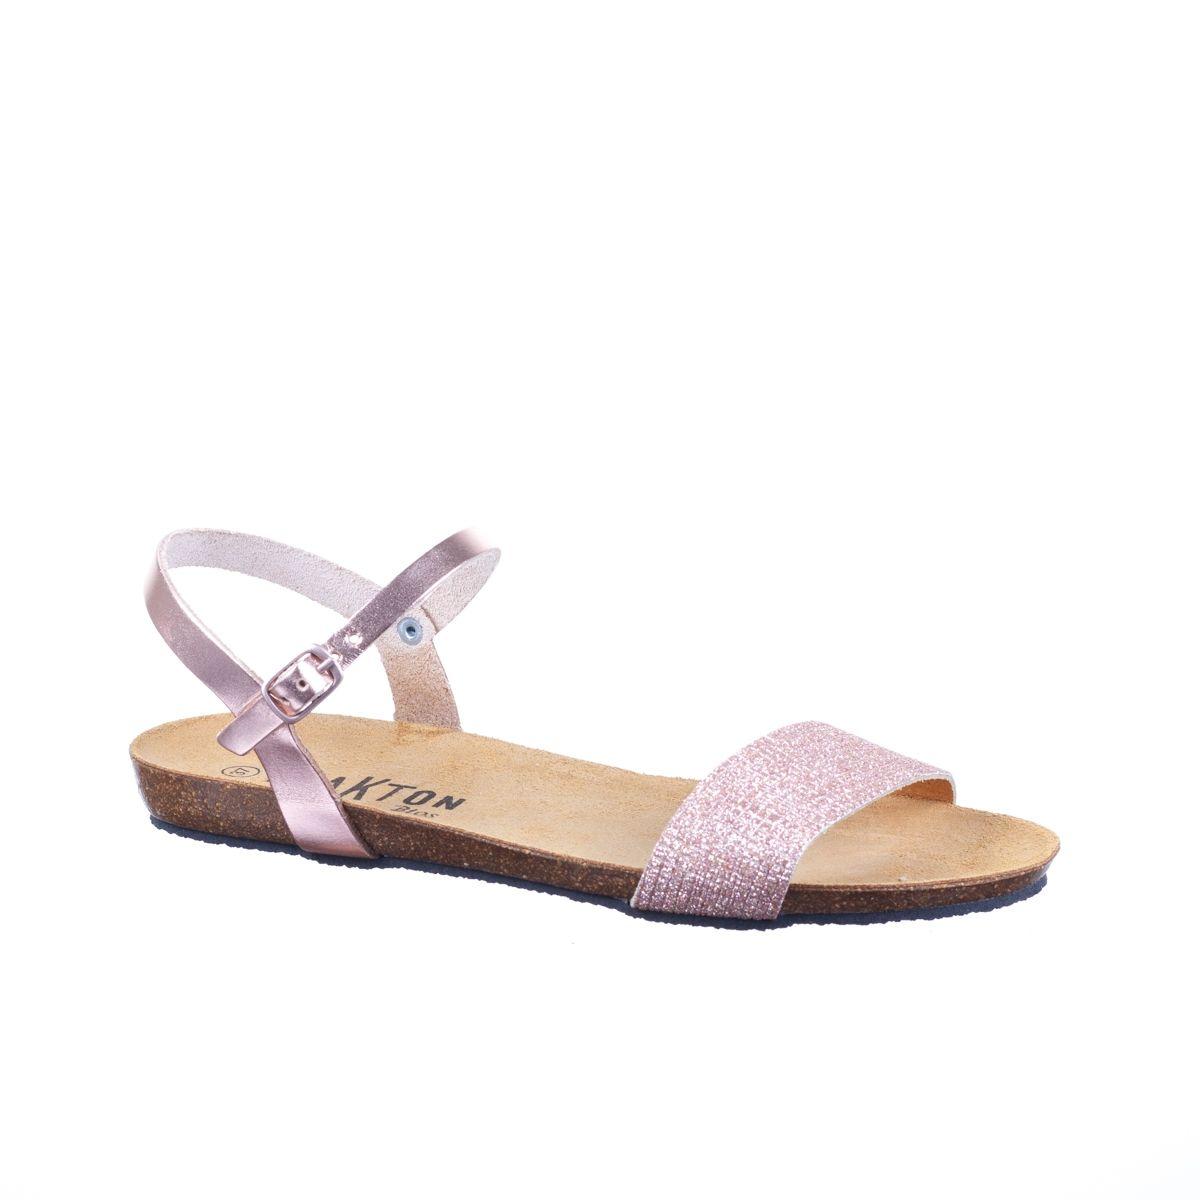 Minka Design Sandales compensées, Kamina en cuir écru